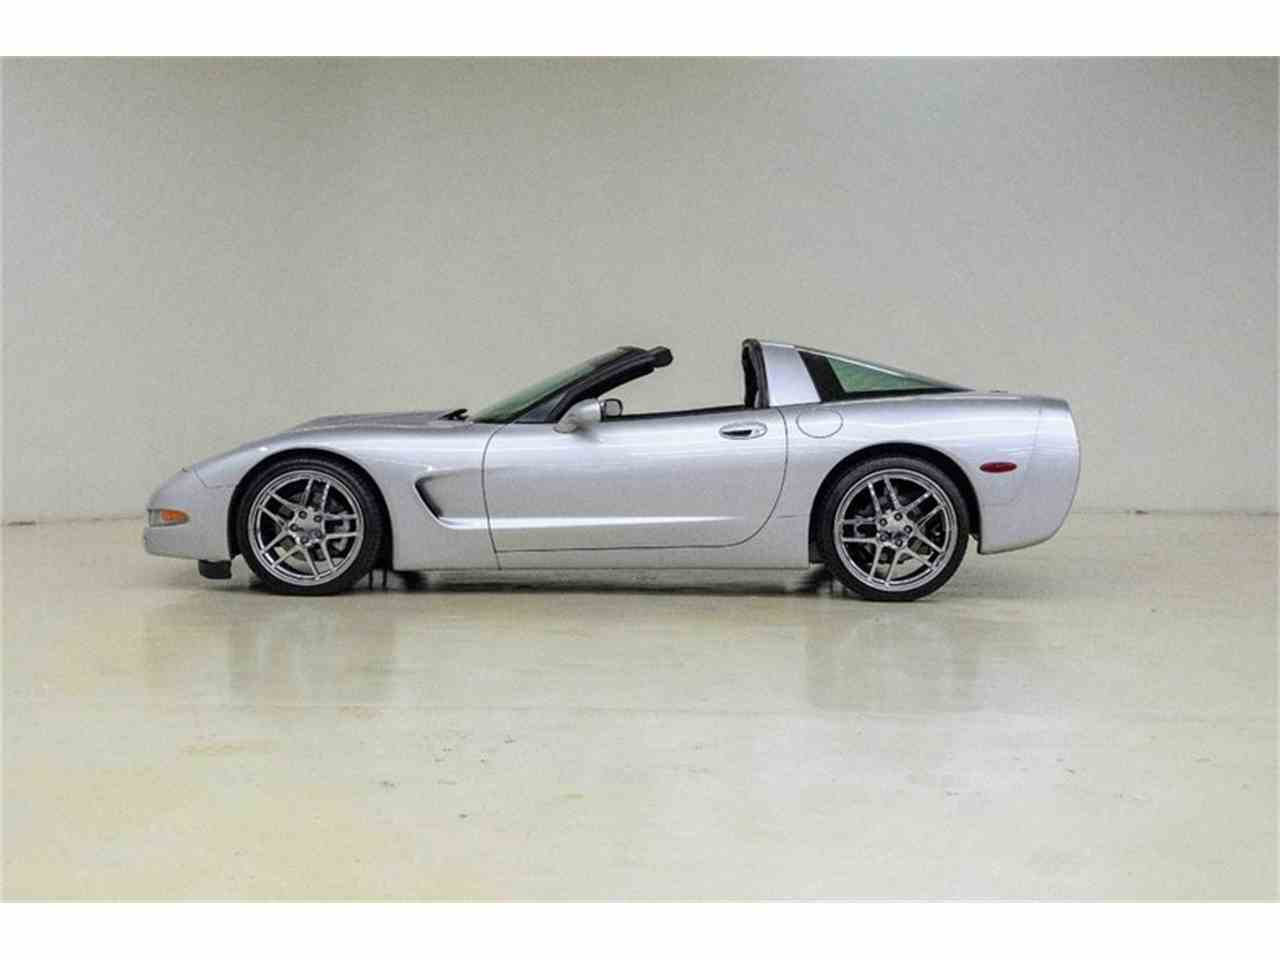 Large Picture of 1999 Corvette located in Concord North Carolina - $16,500.00 - L5RU